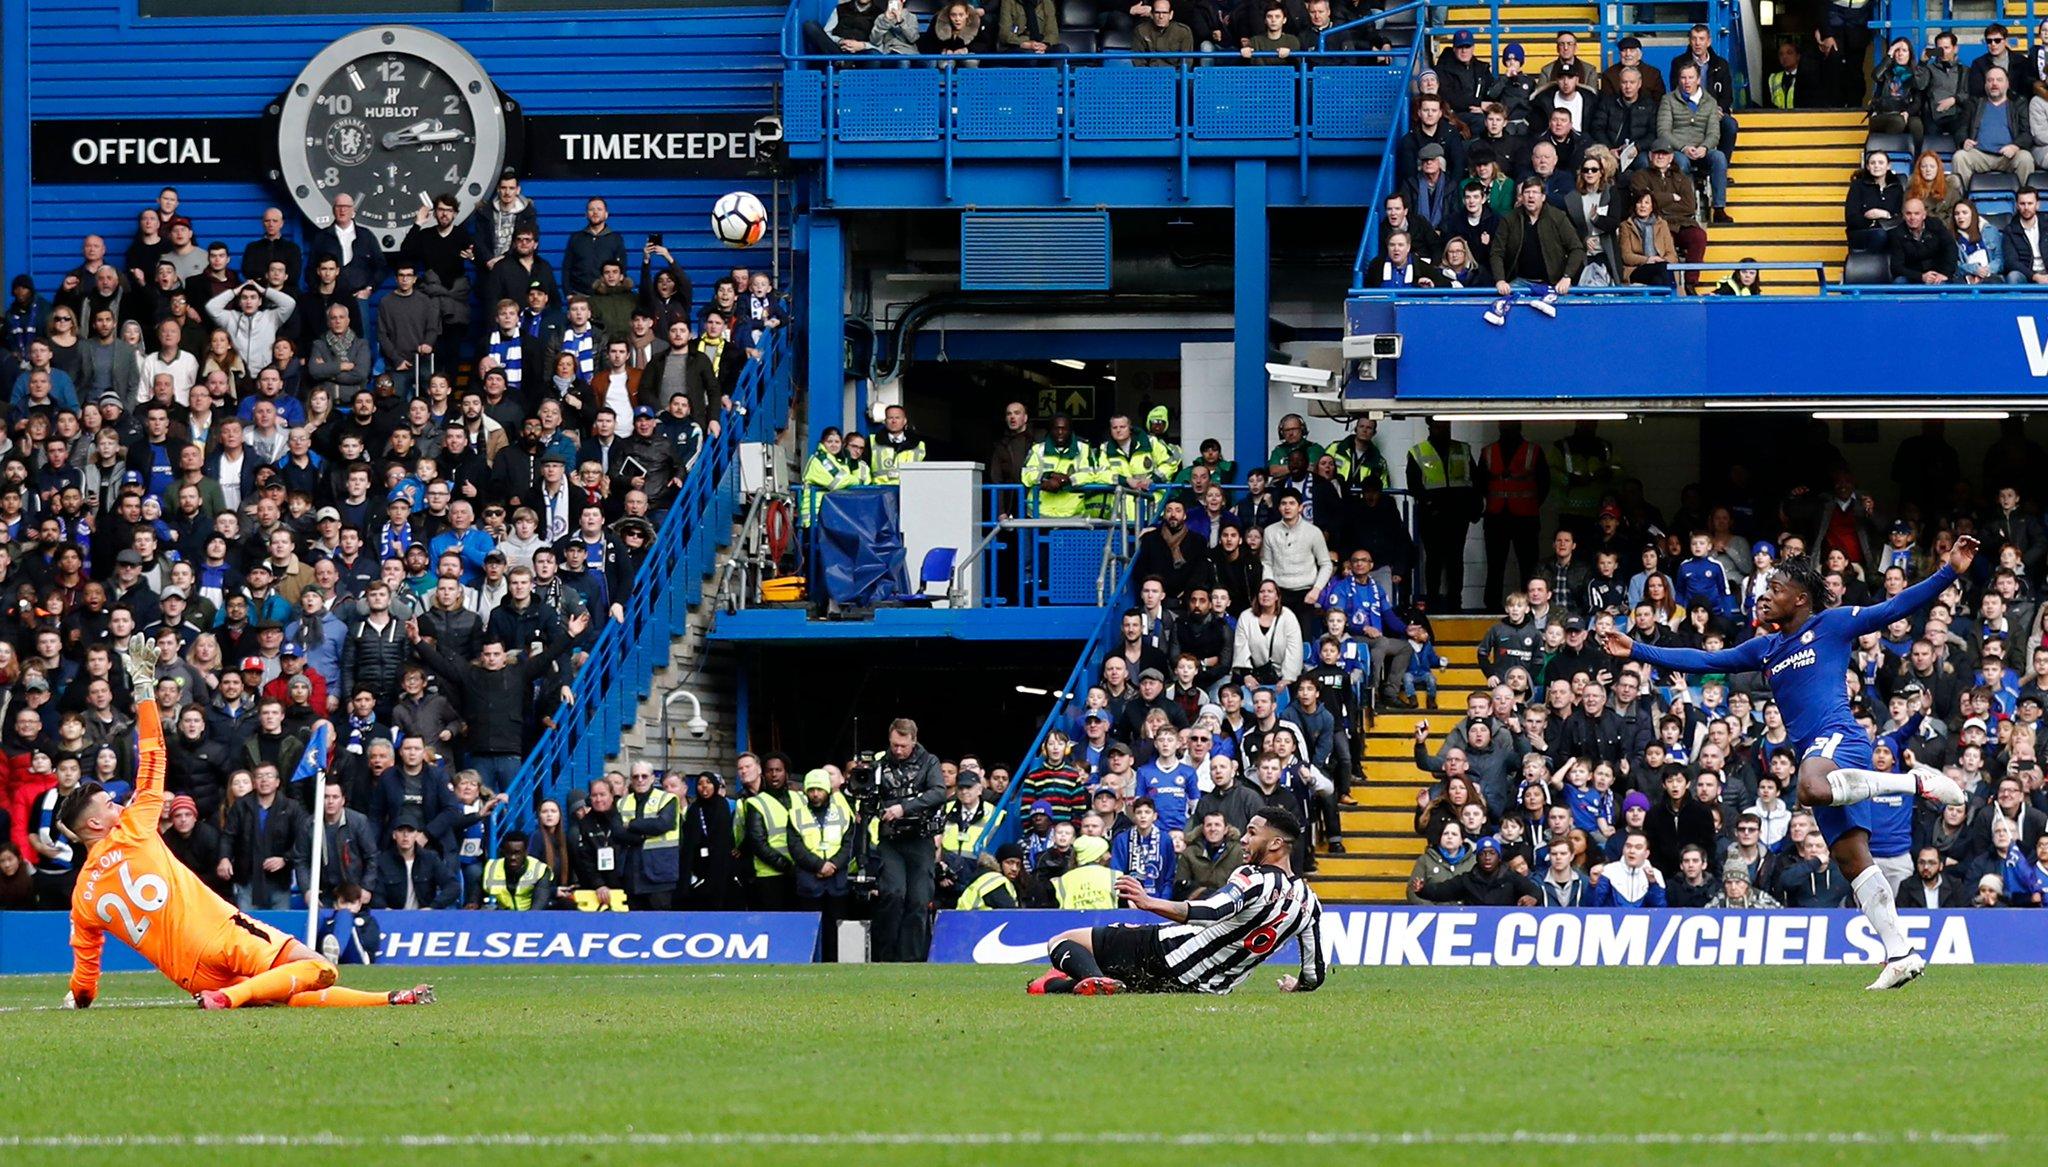 Chelsea FC vs Newcastle United Highlights 3-0 FA Cup